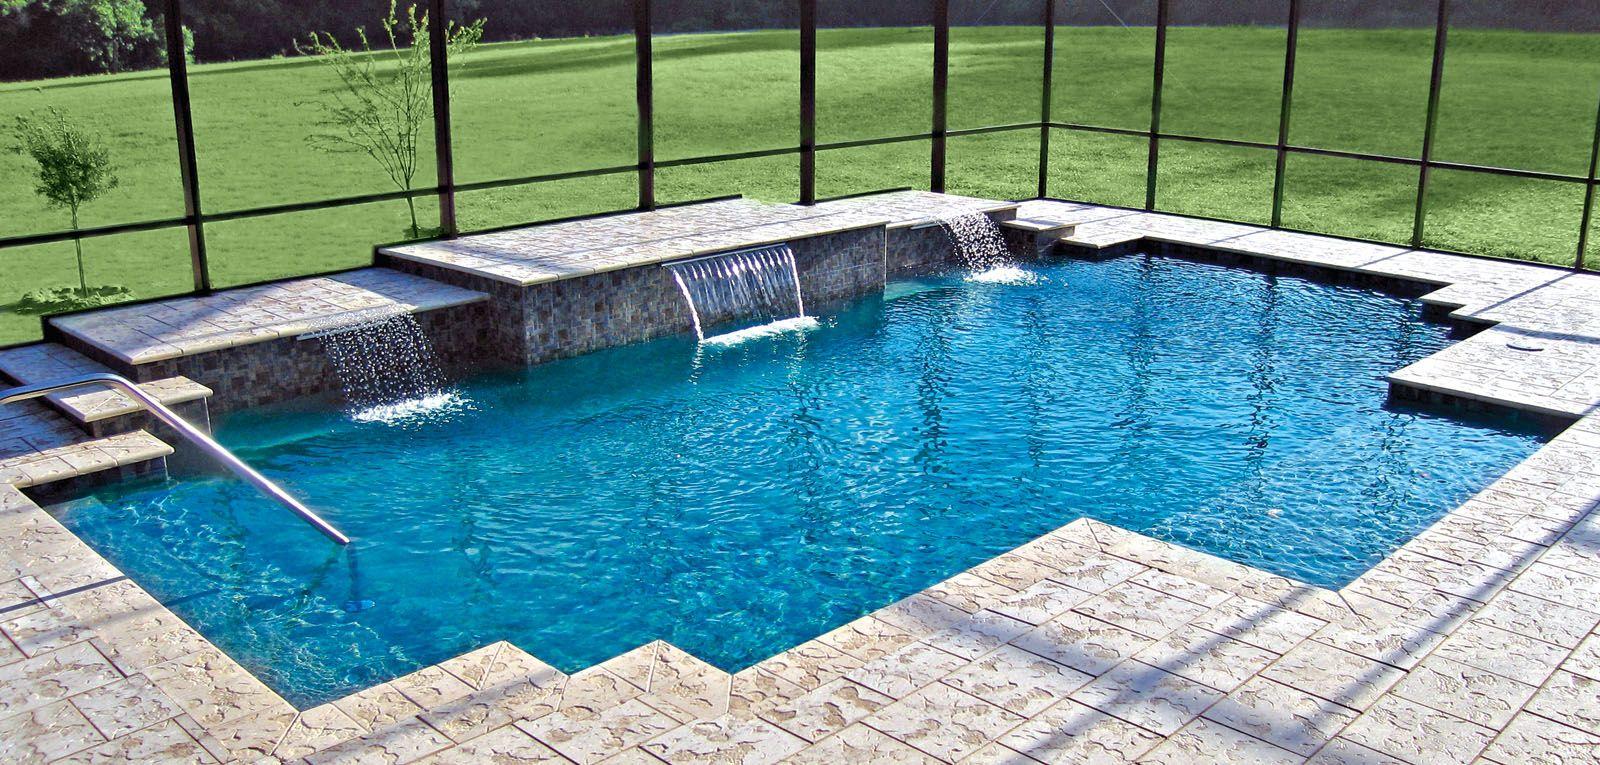 Geometric Pool Photos | Pinterest | Swimming pools, Spa and Garden